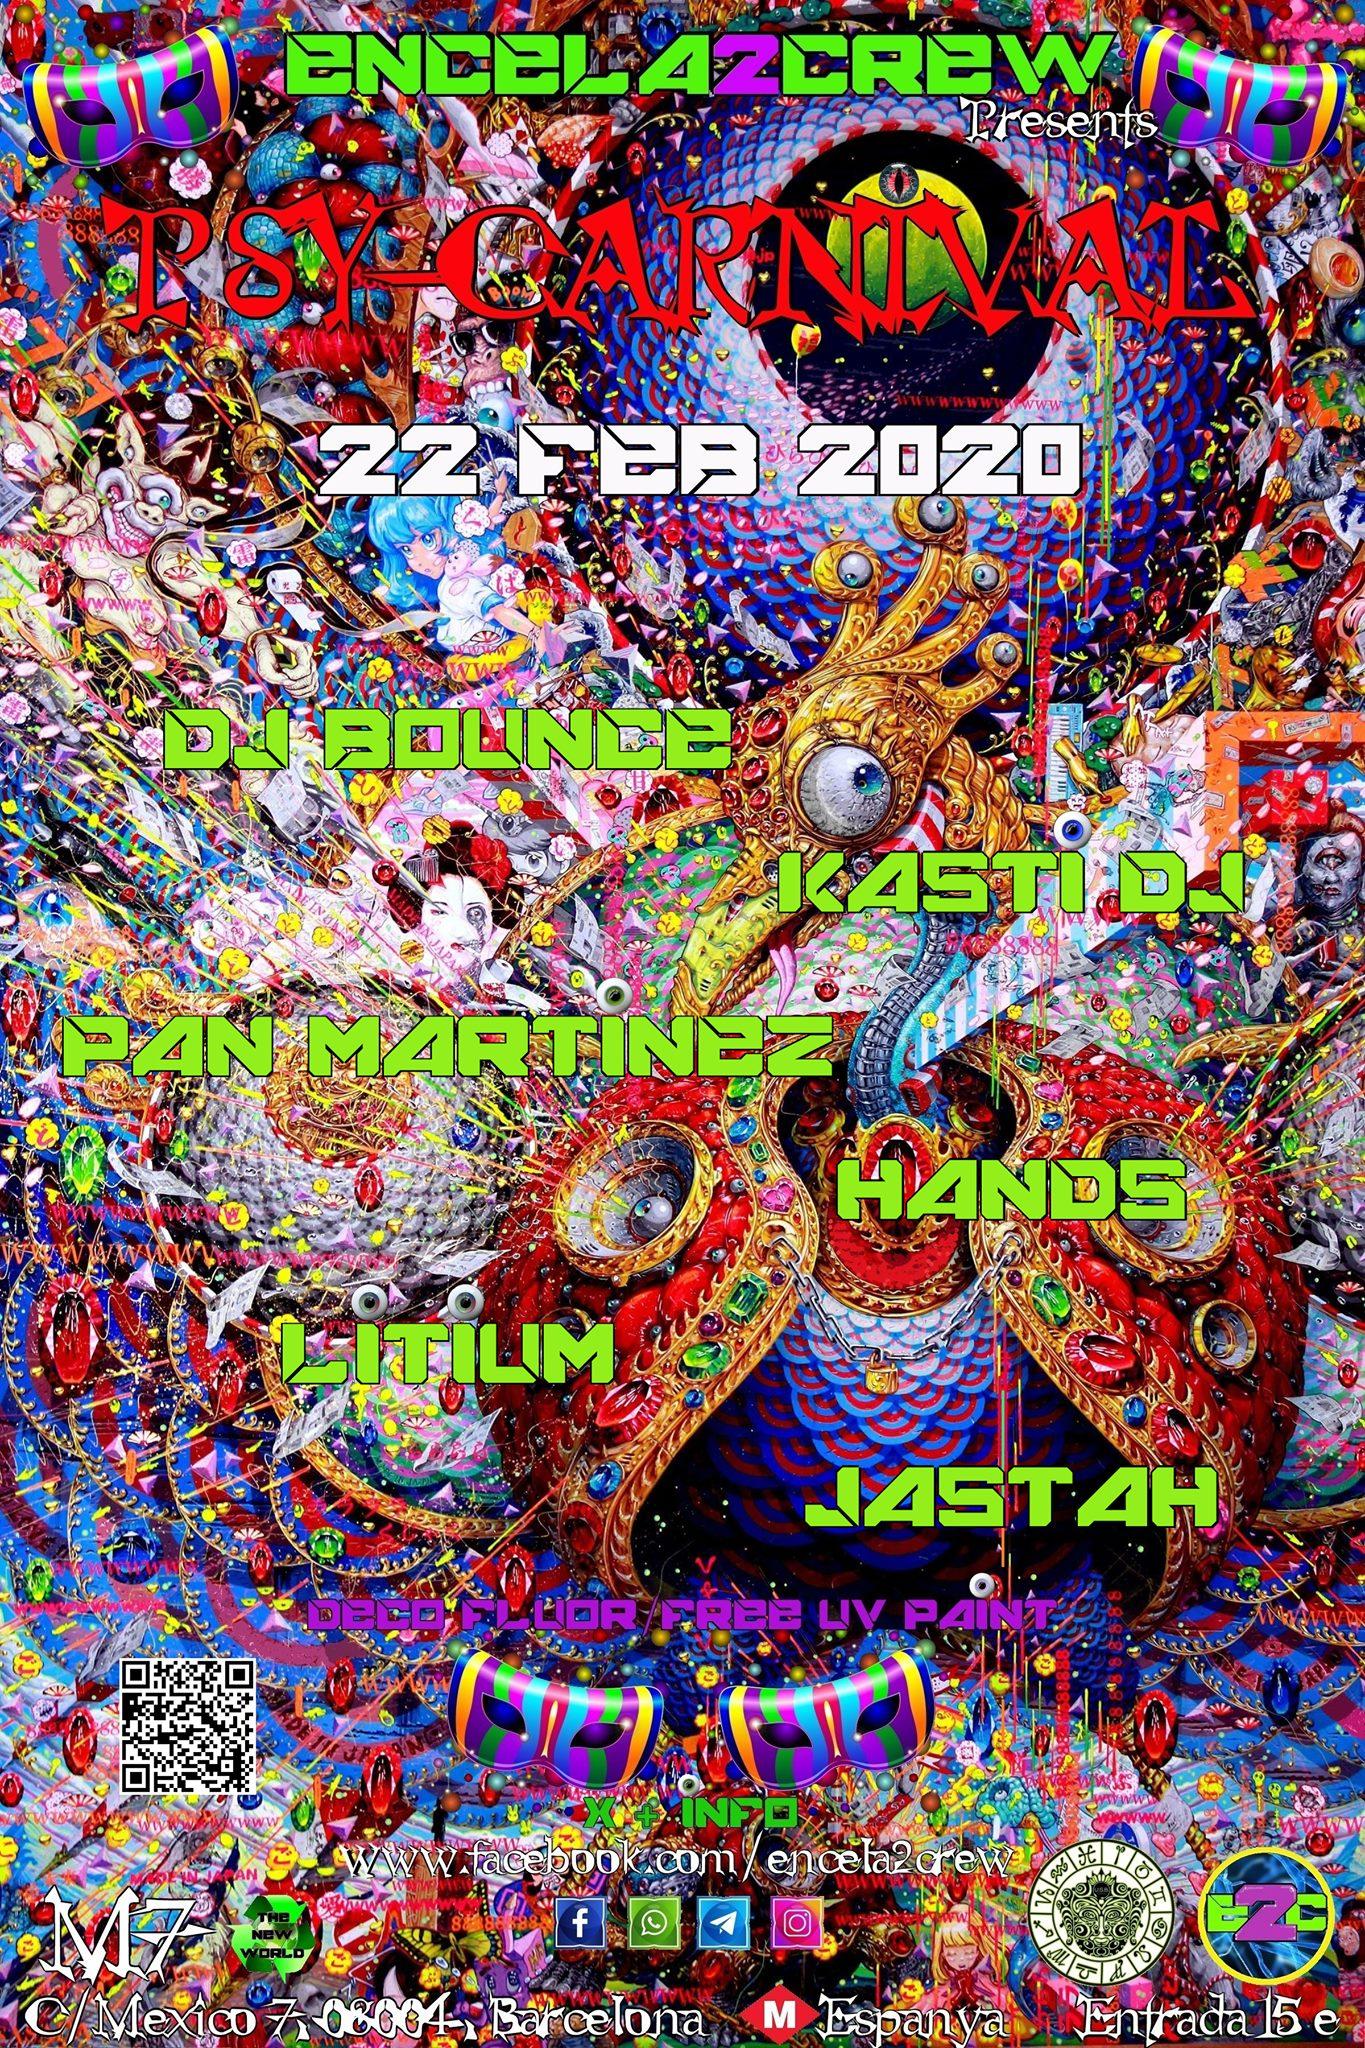 Encela2crew Presents: Psy-Carnival